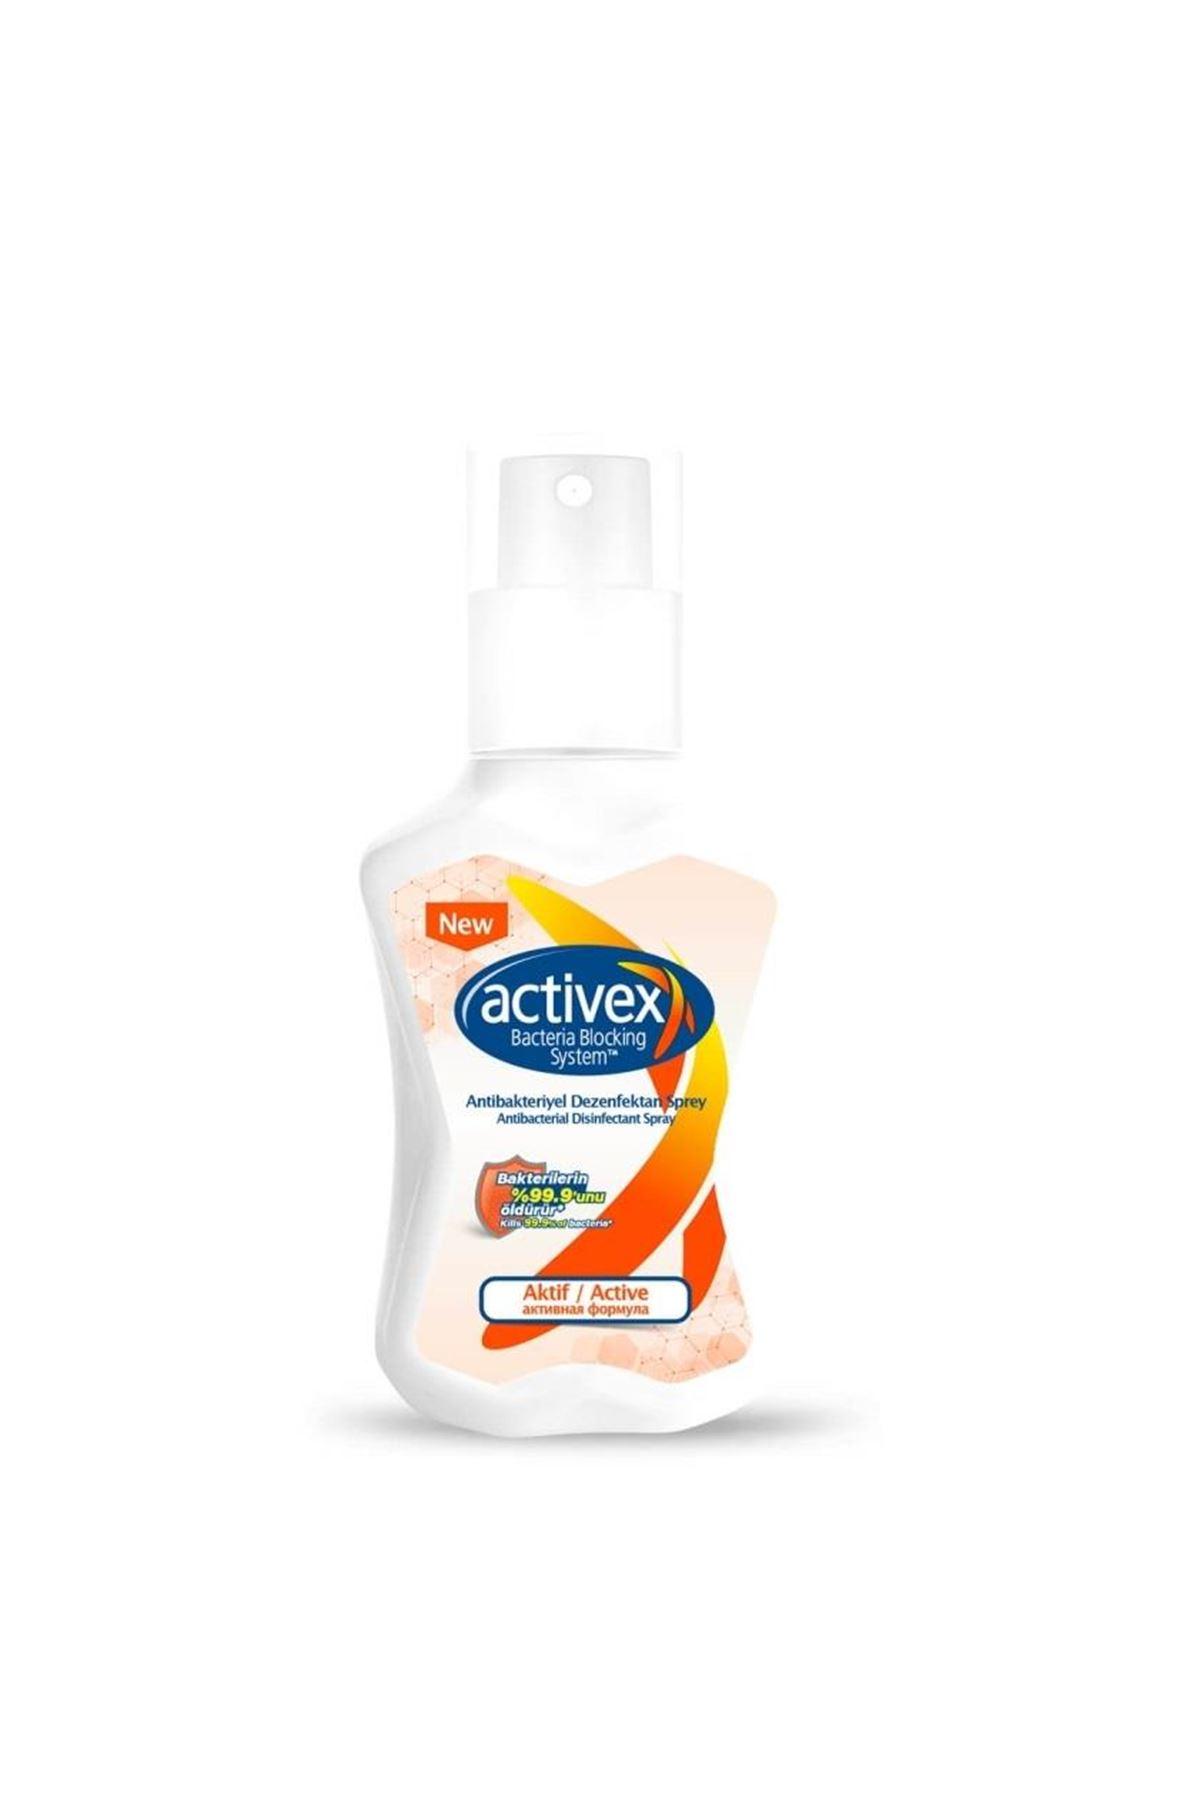 Activex Antibakteriyel Dezenfektan Sprey Aktif 100 ml